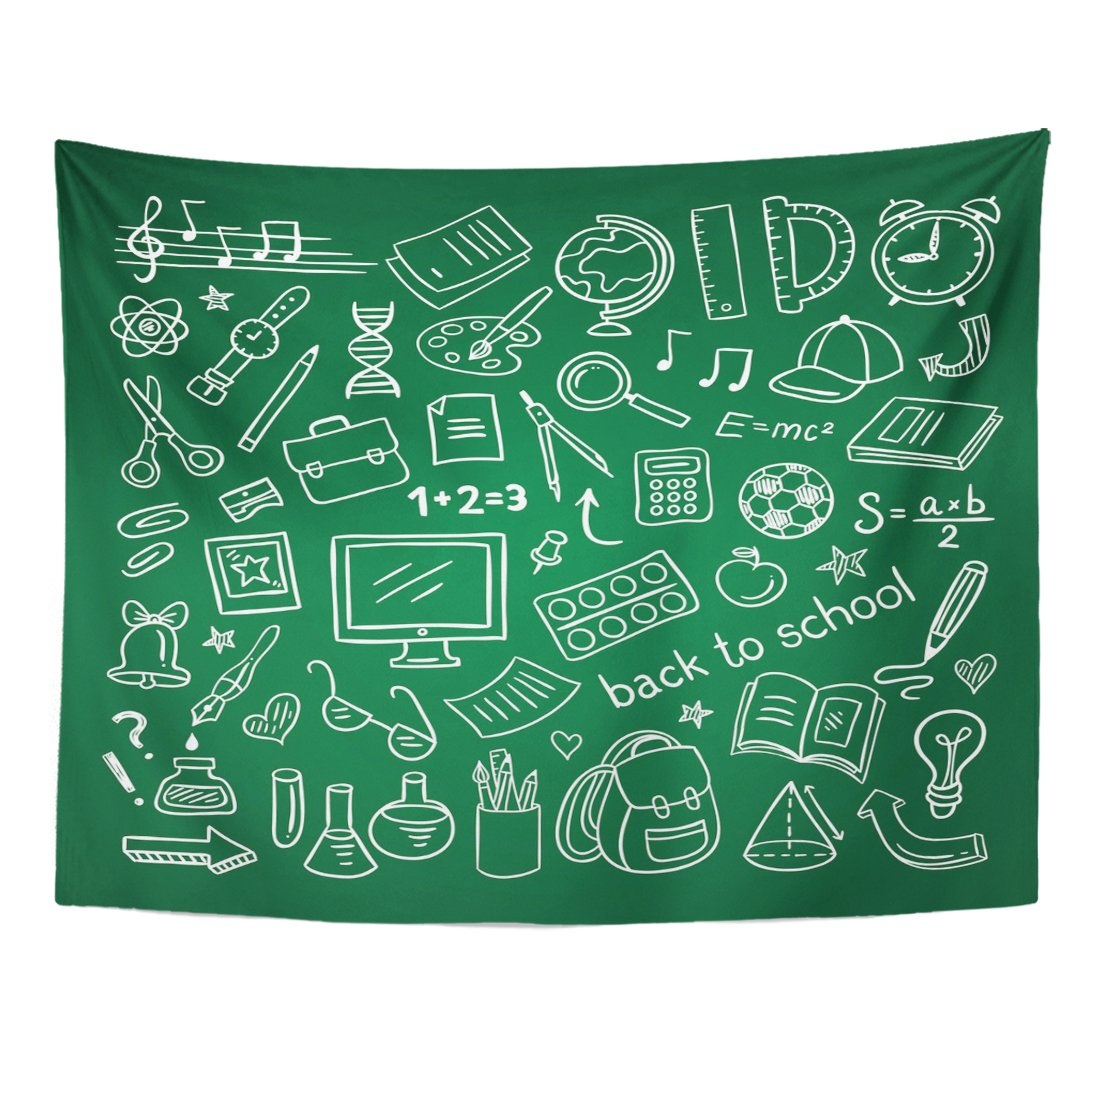 varyhomeタペストリーKids School Doodle教育と科学シンボルStuffホームインテリア壁Hangingのリビングルームベッドルーム寮 60